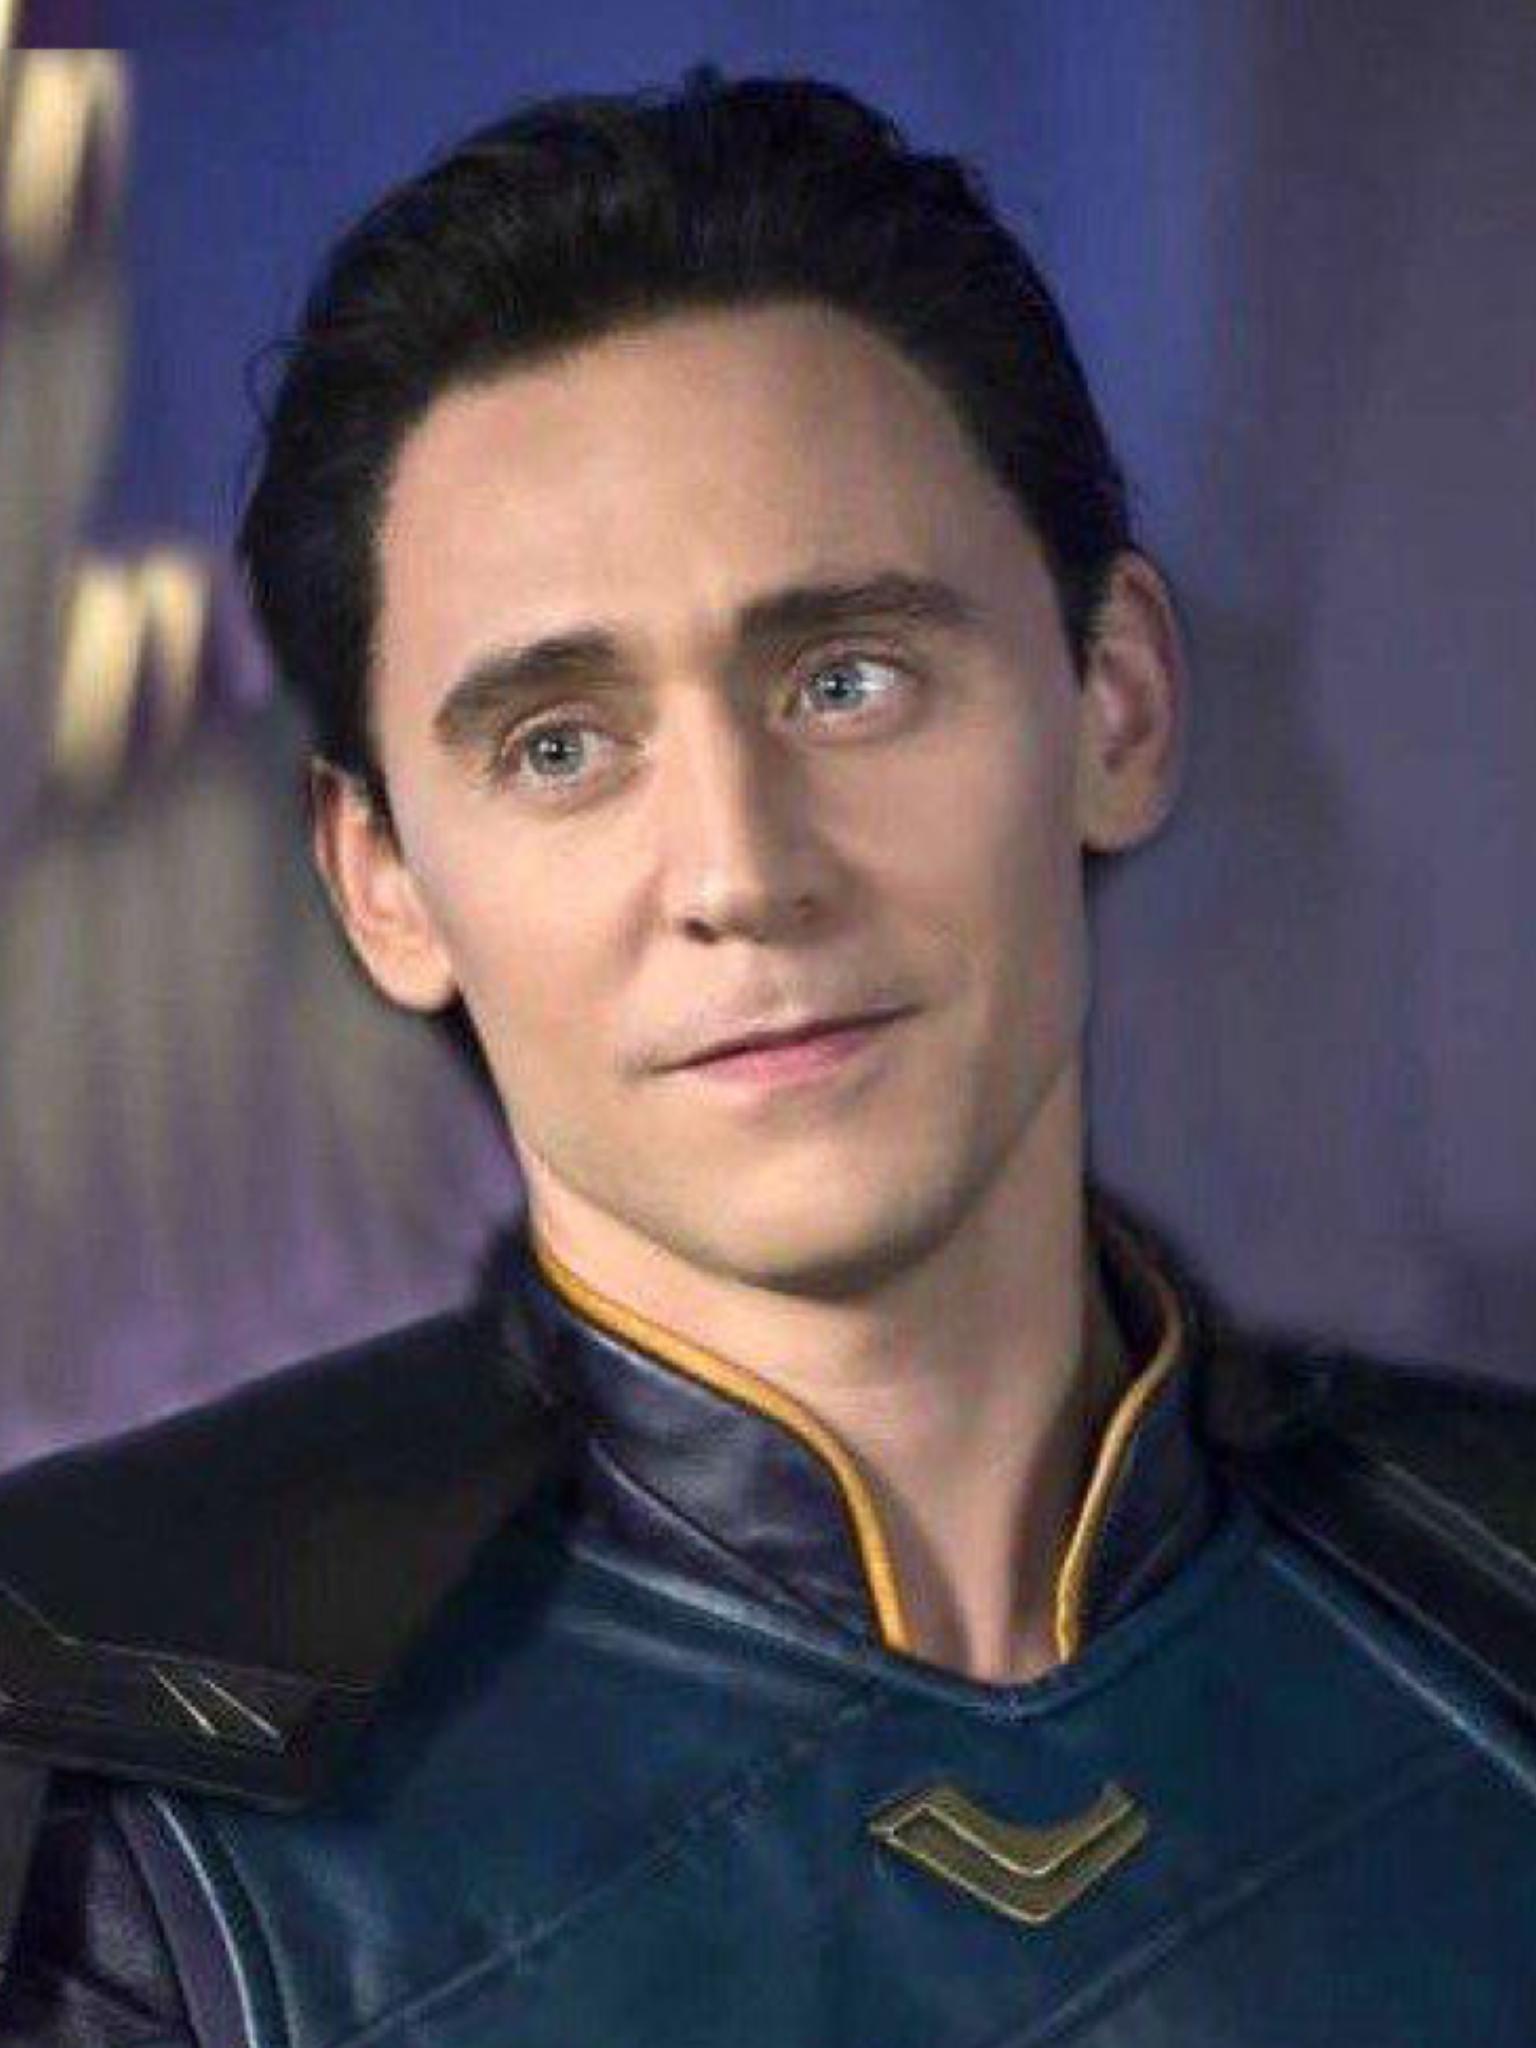 Loki With Short Hair Doesn T Look The Same Loki We Know And That Terrifies Me Loki Marvel Loki Fanart Loki Art